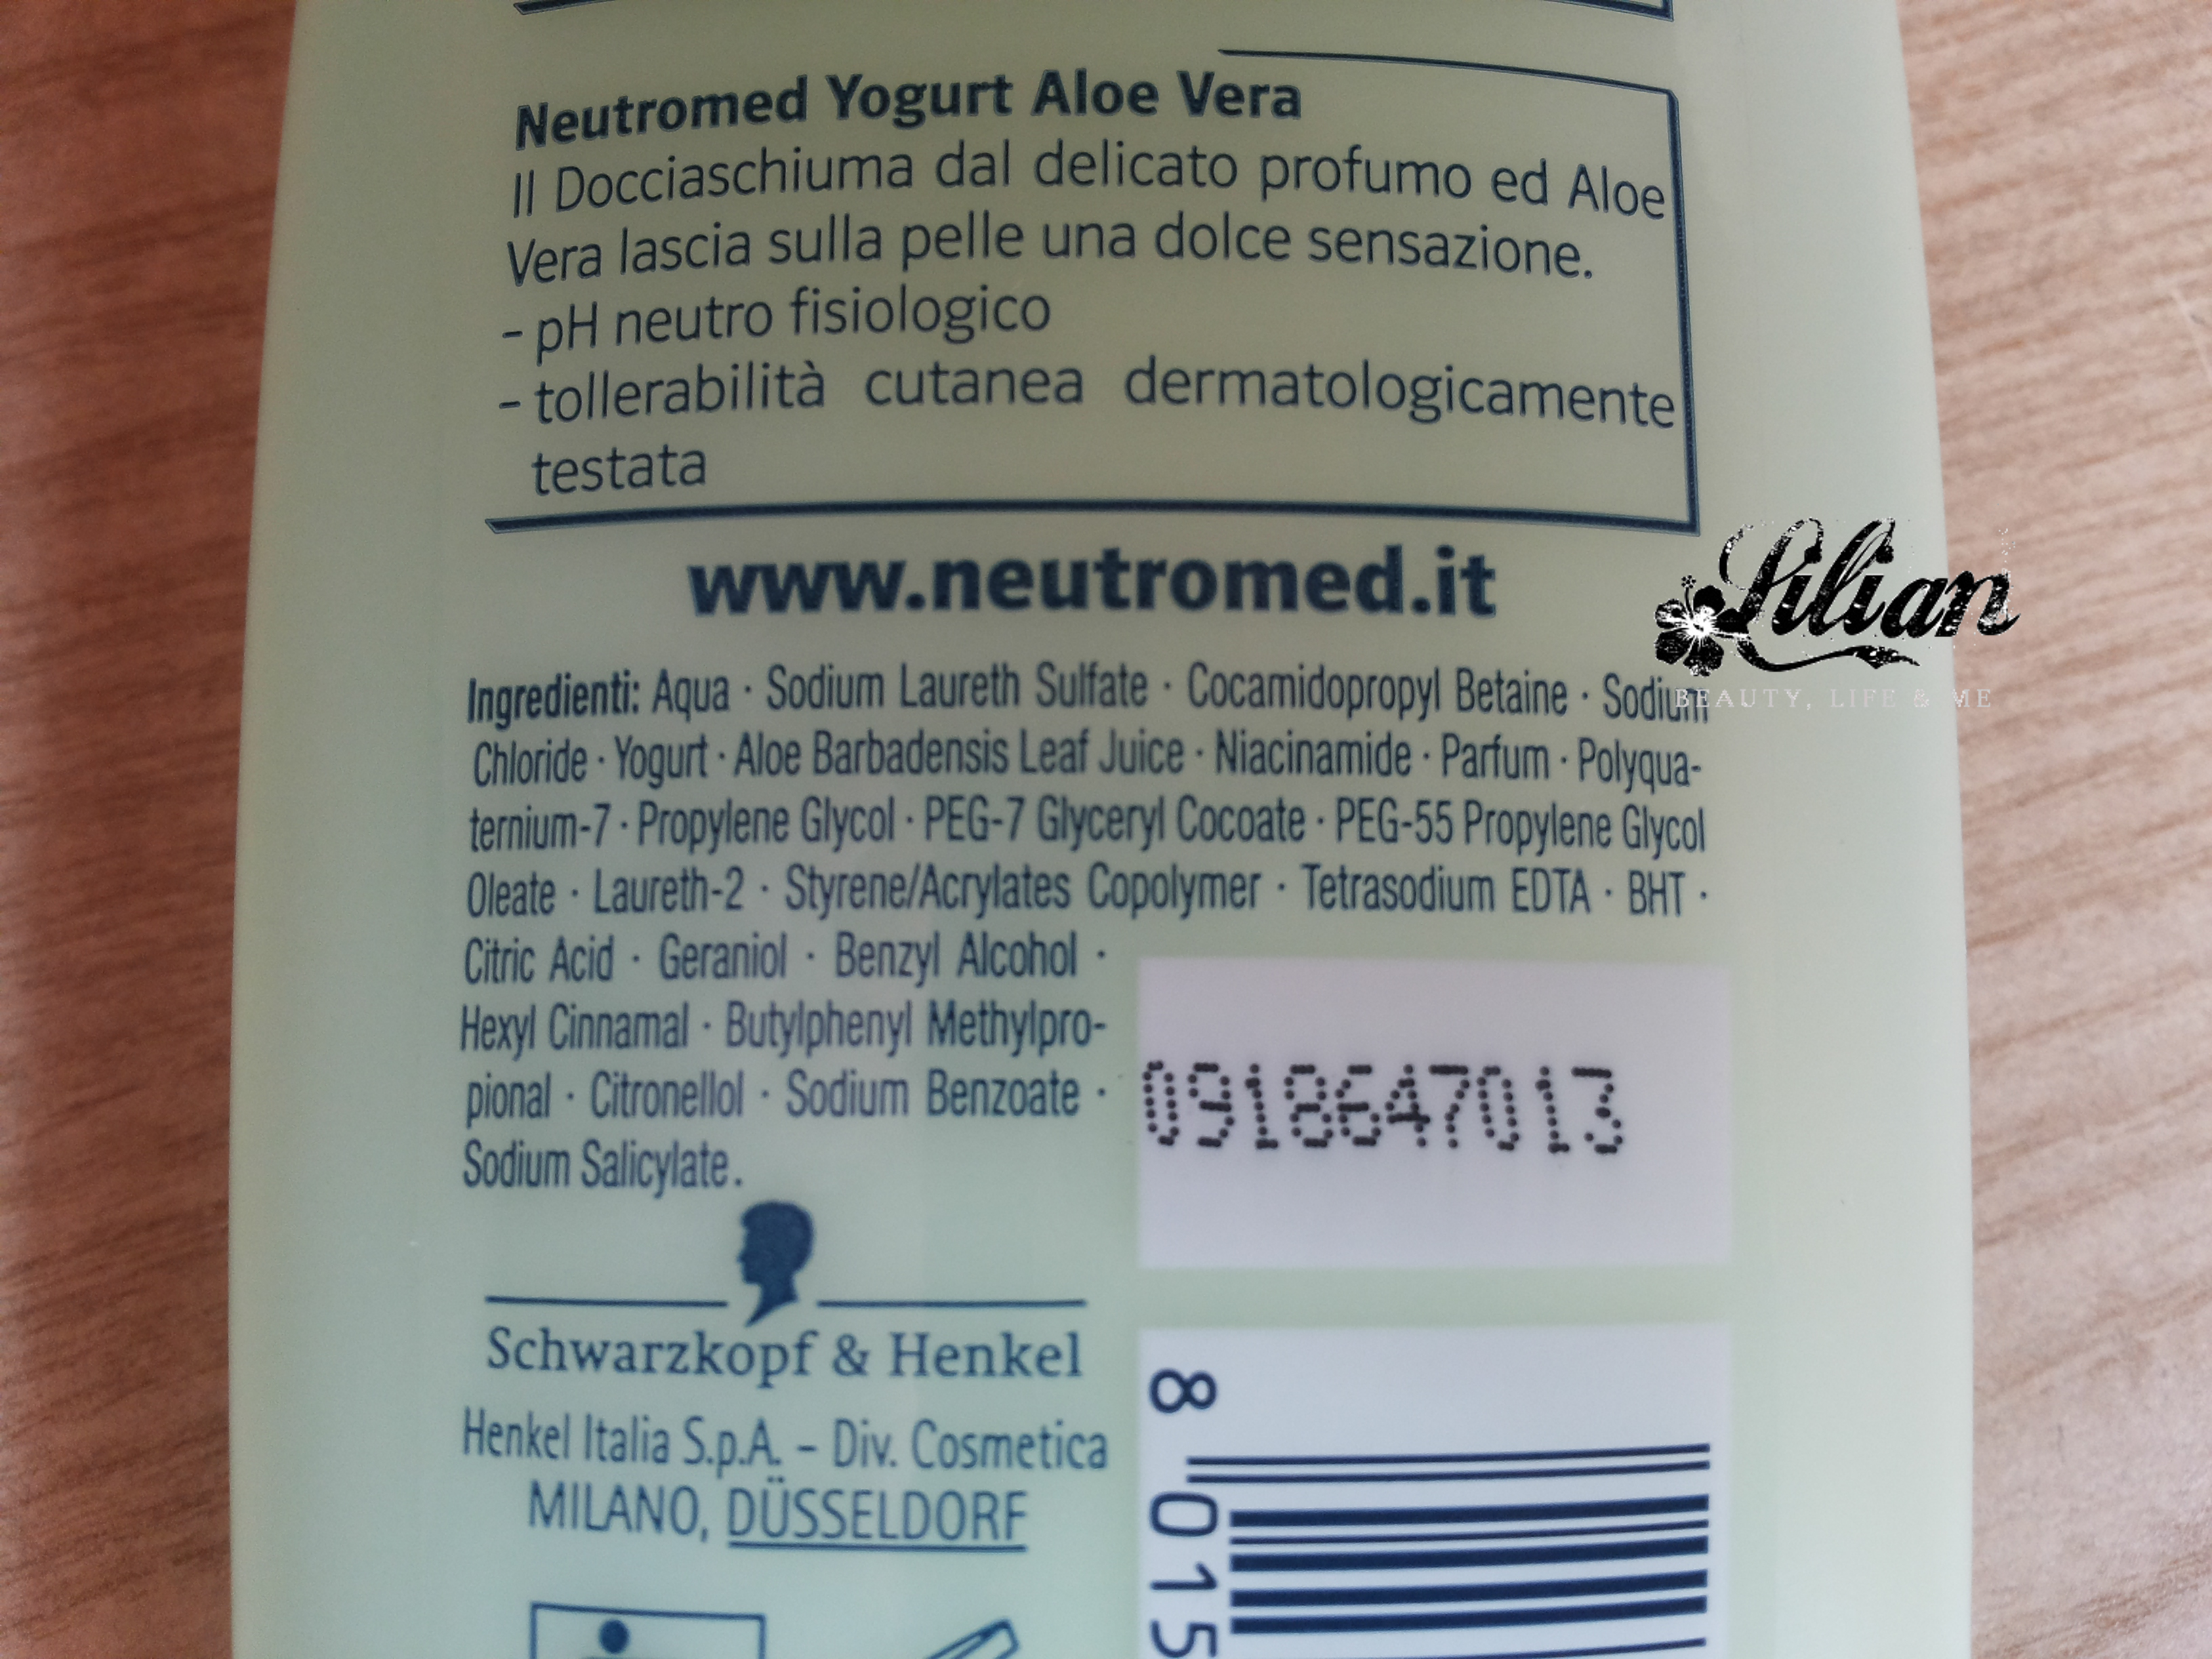 bagnoschiuma neutro med aloe vera 2